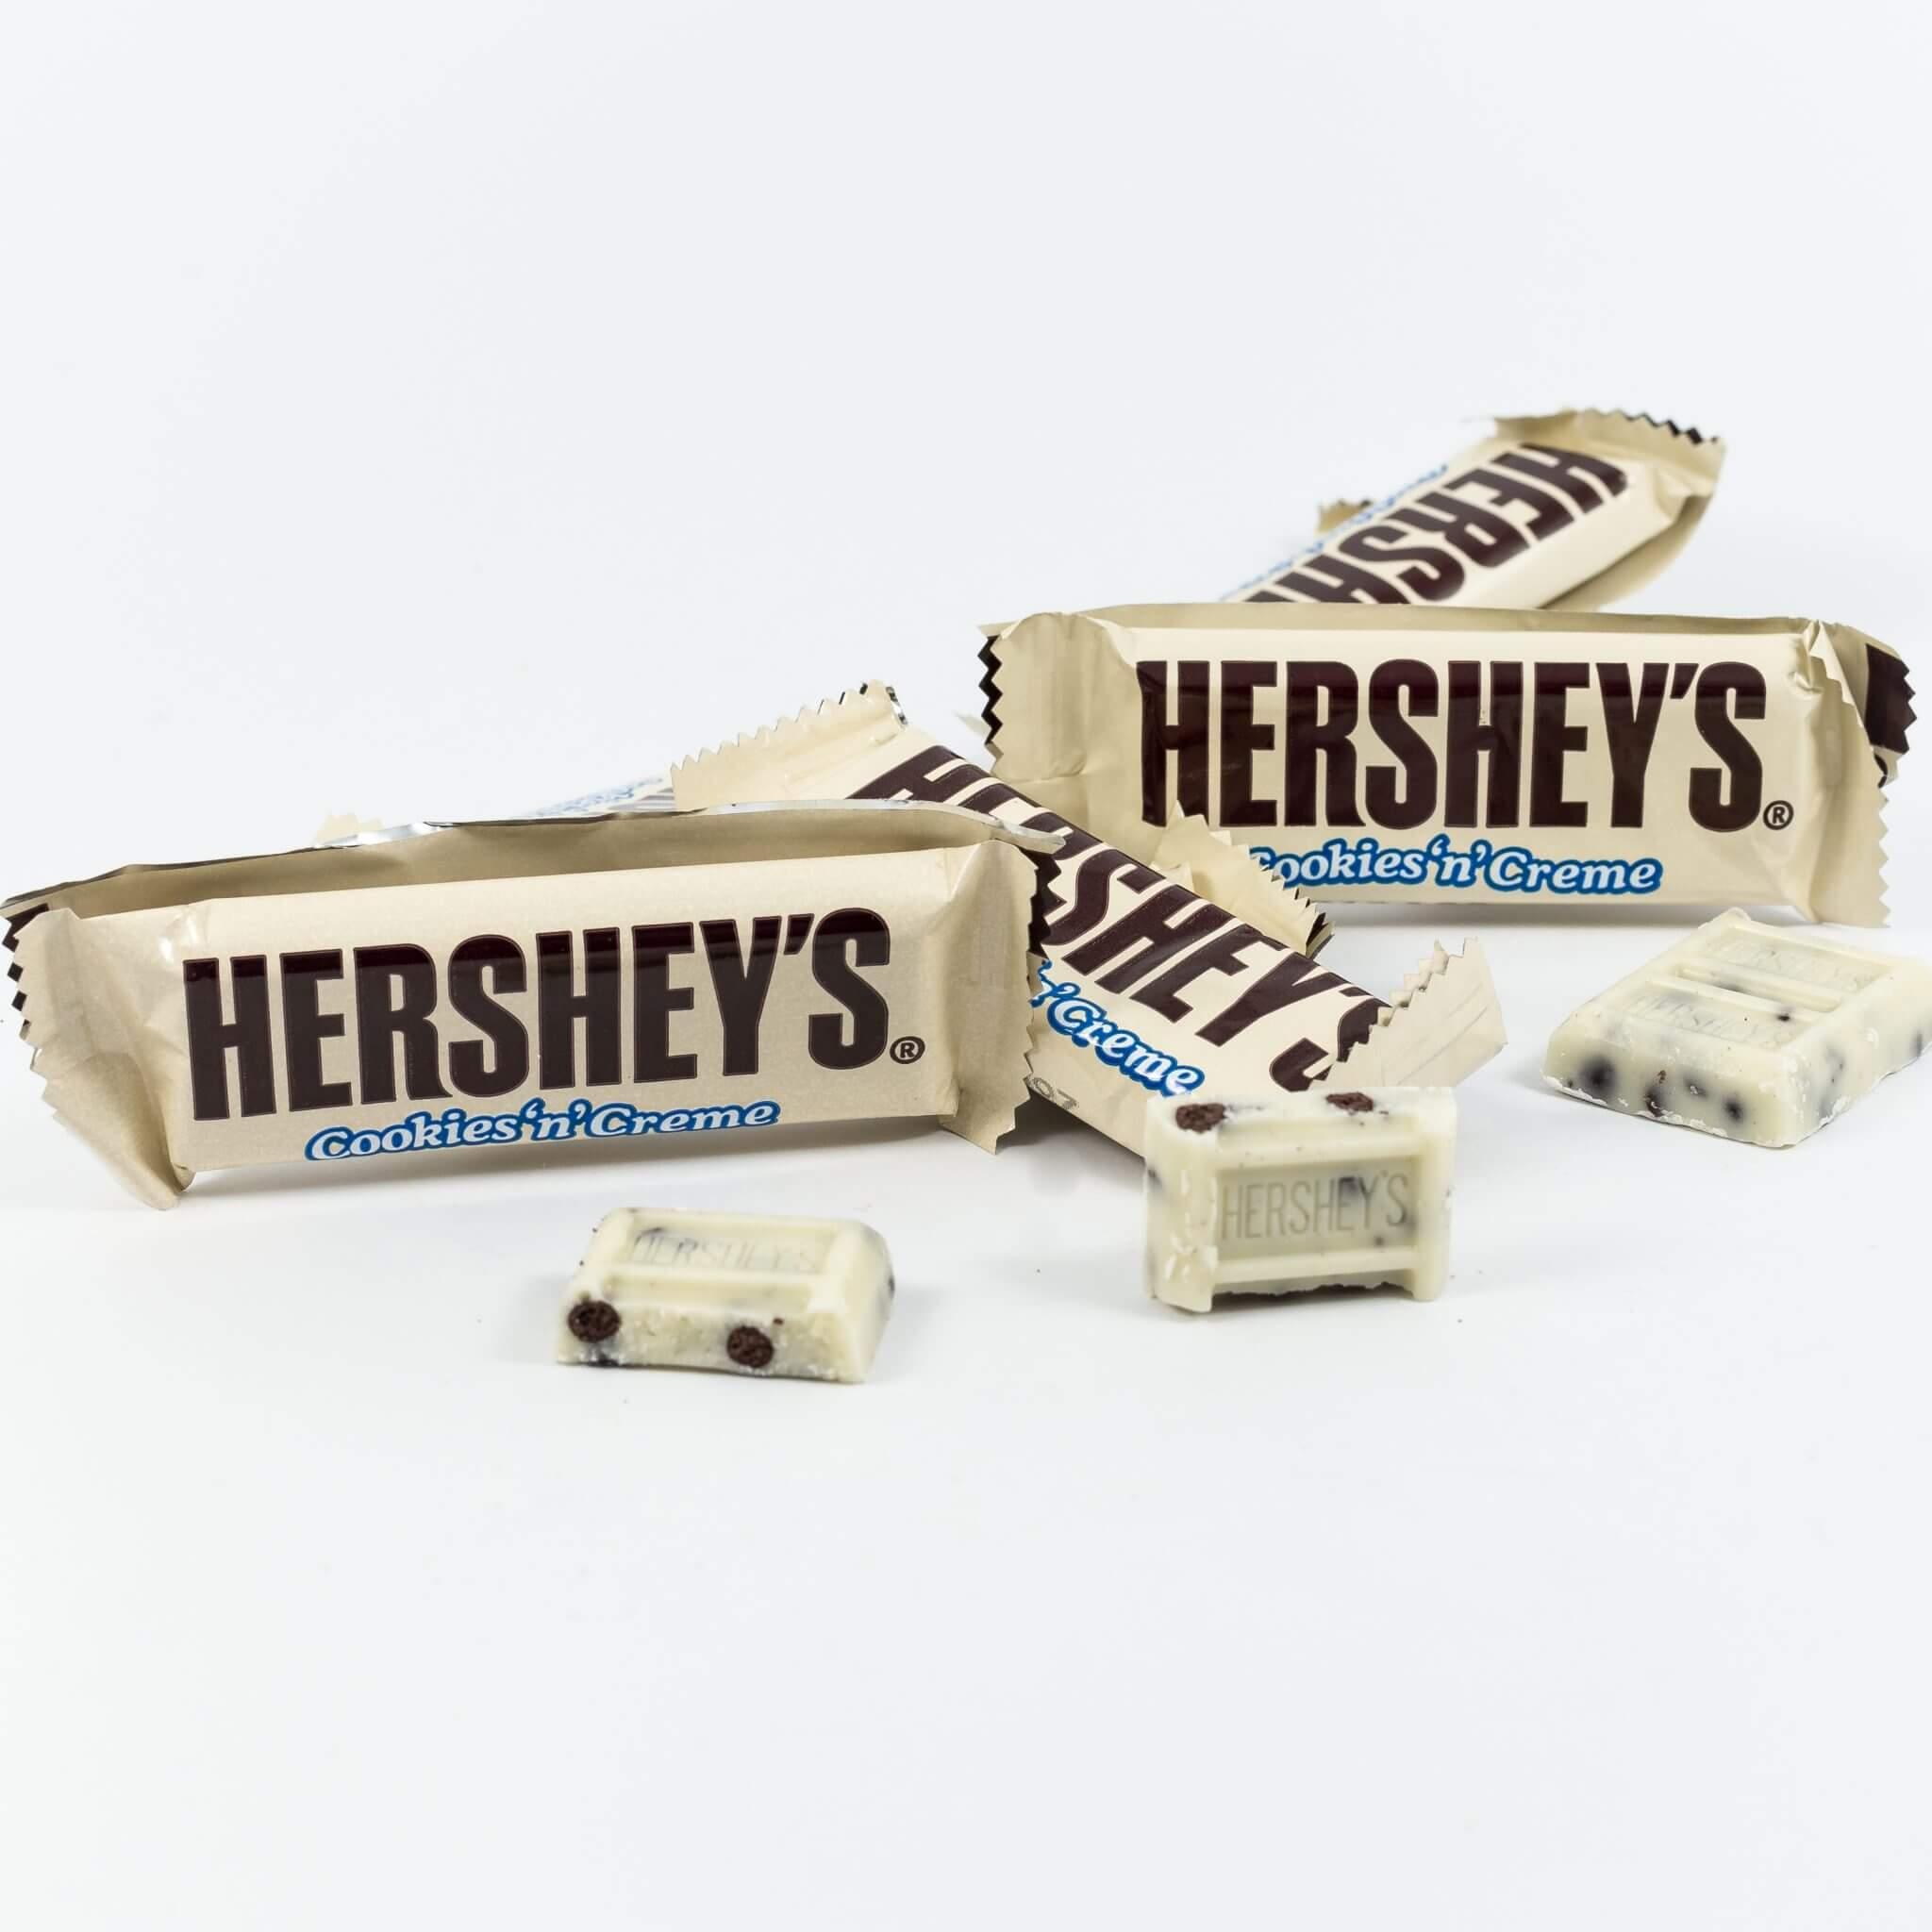 Hersheys Cookies & Cream